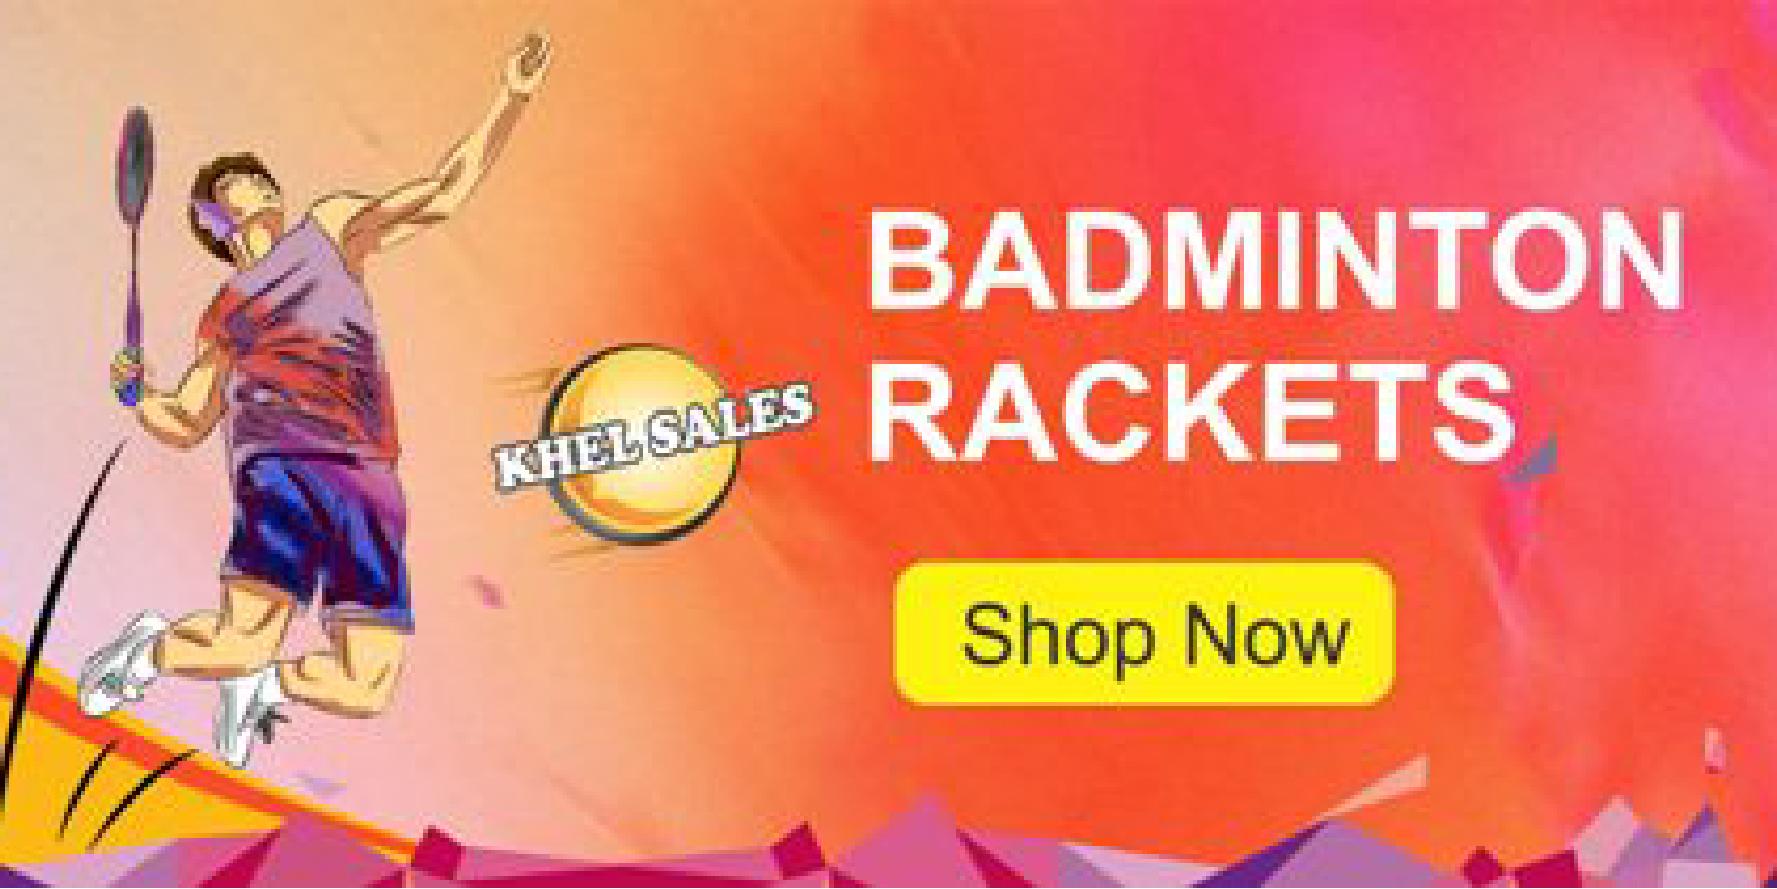 50% OFF on Badminton Racket